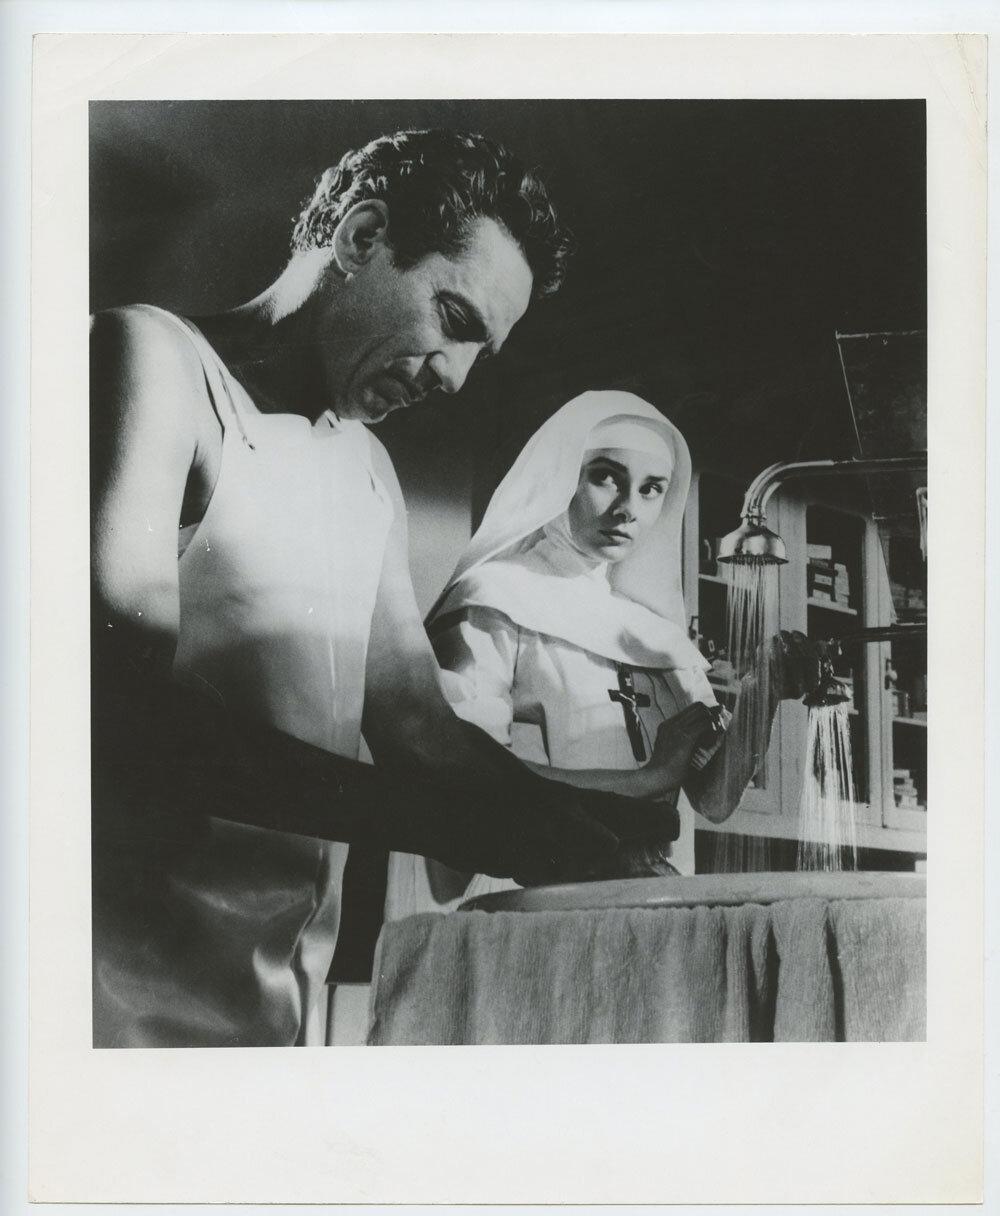 Audrey Hepburn Photograph 1959 The Nun's Story Original Vintage